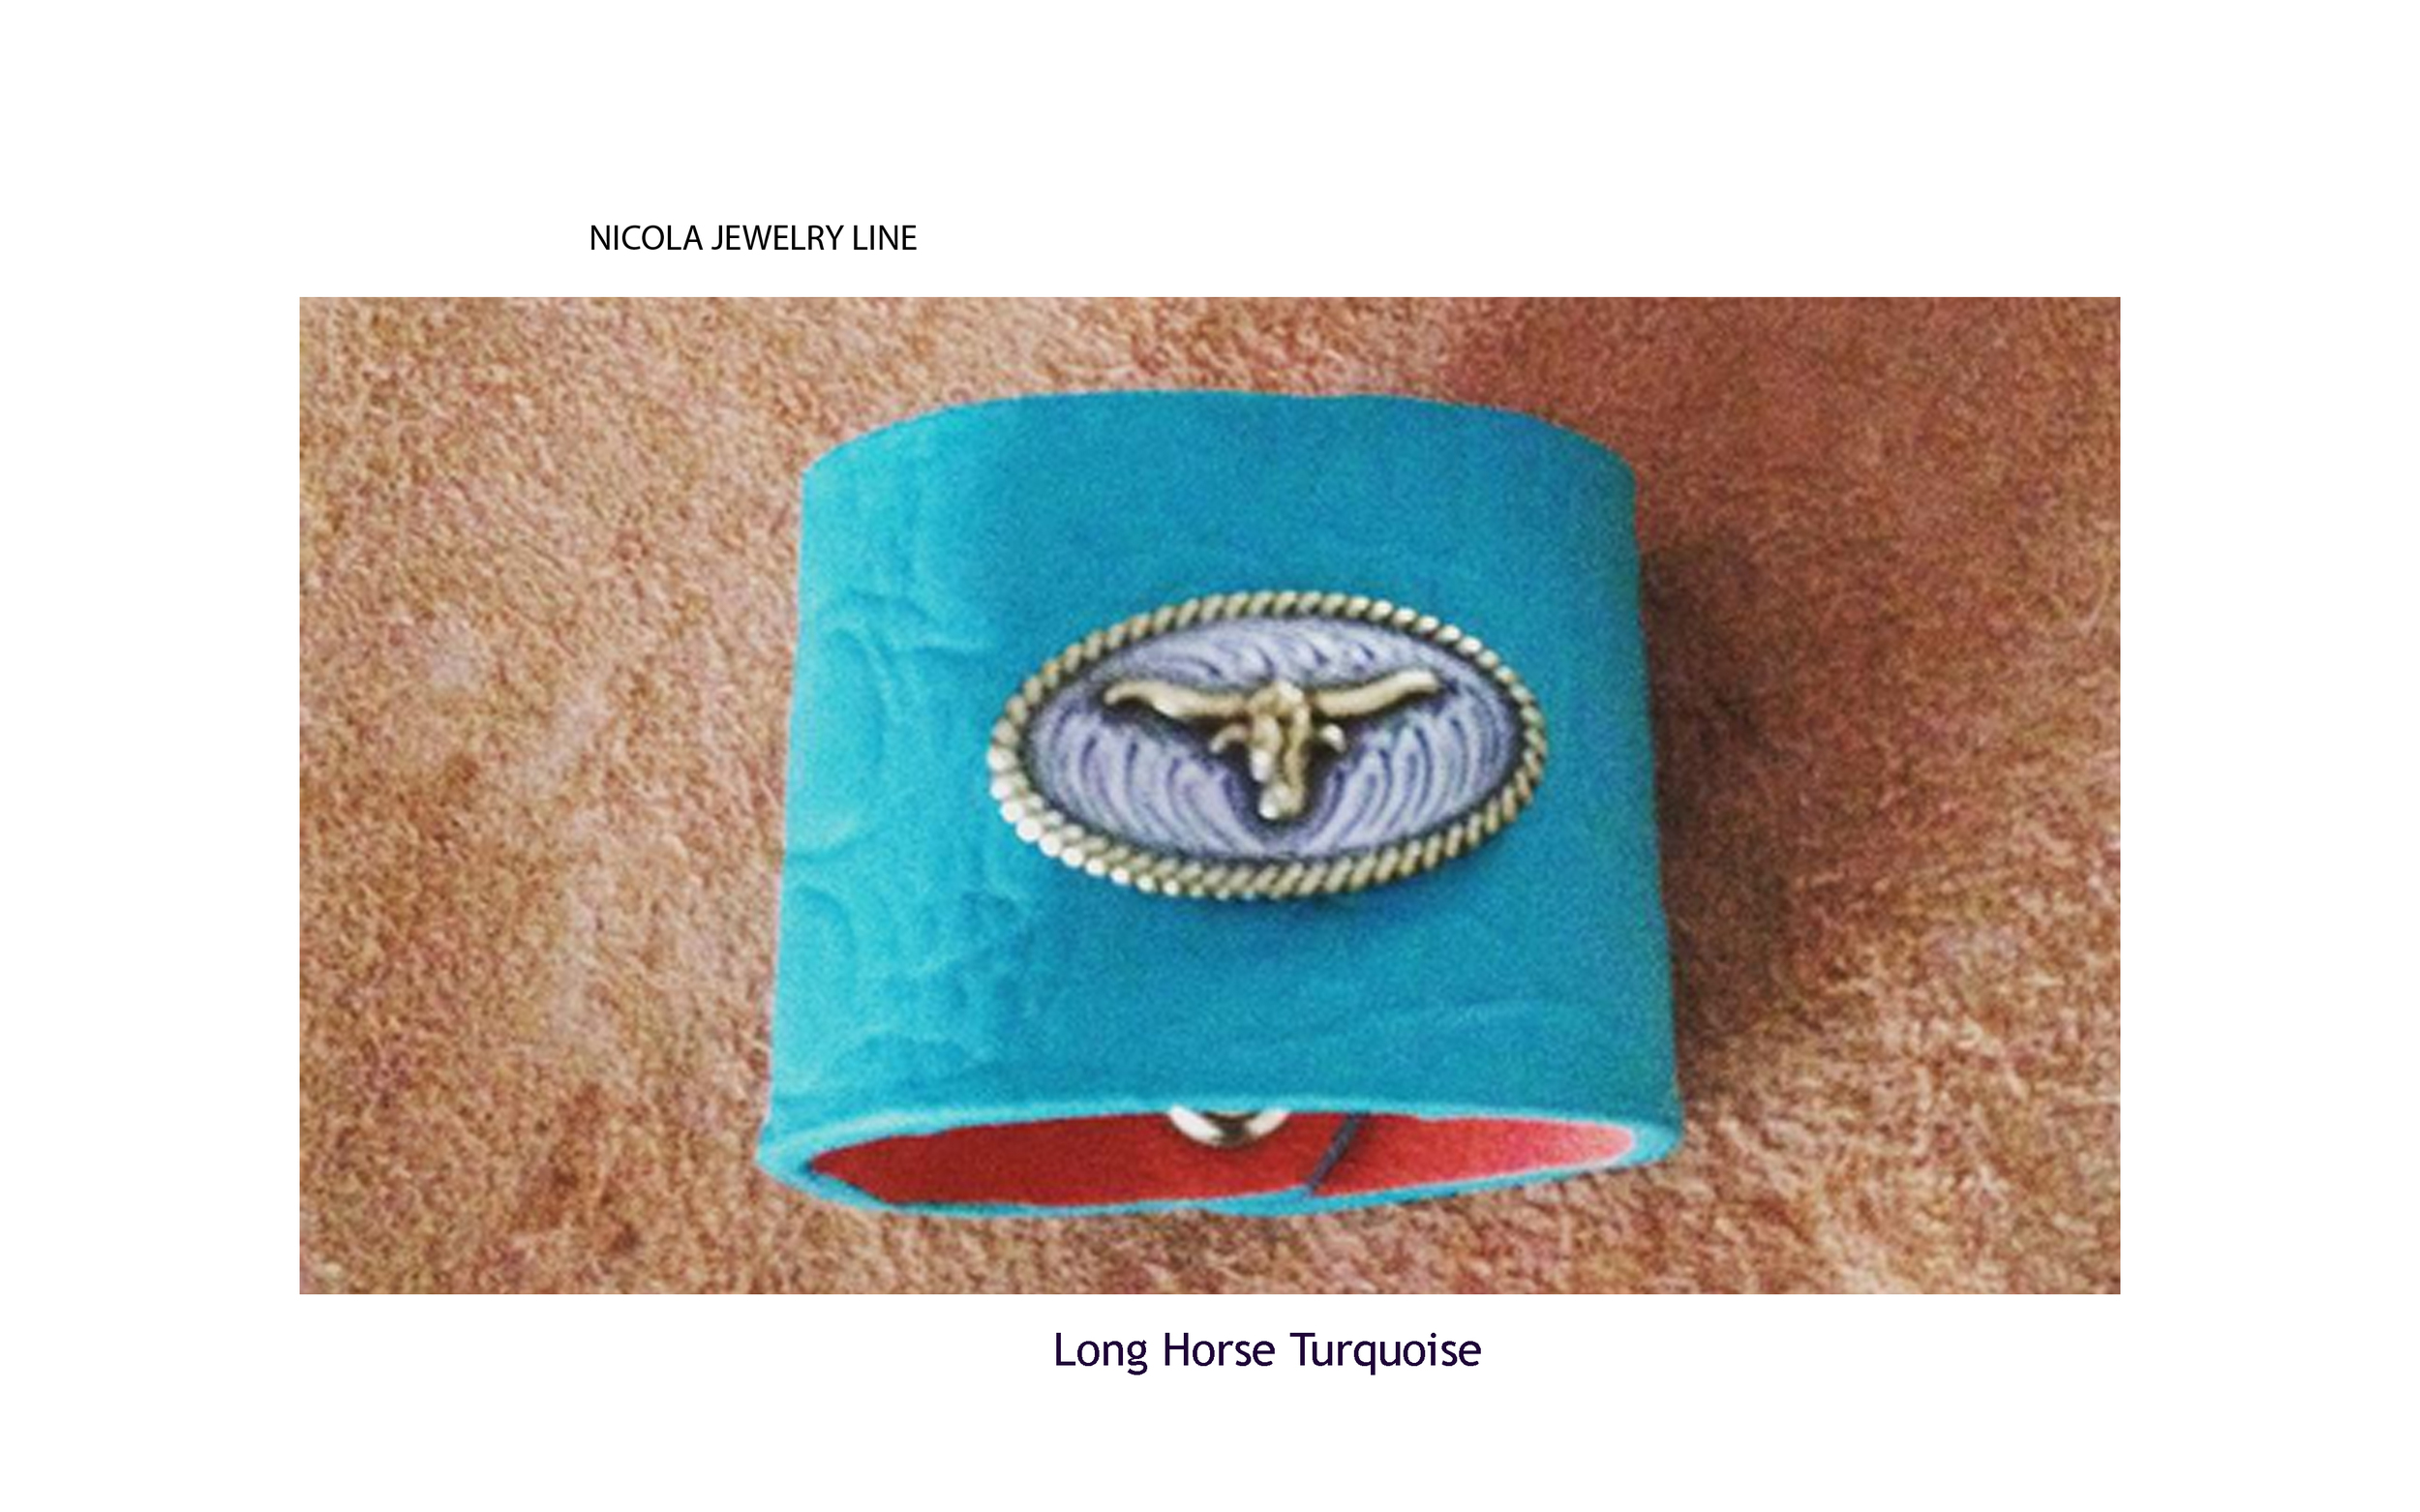 long horse turquoise copy.jpg